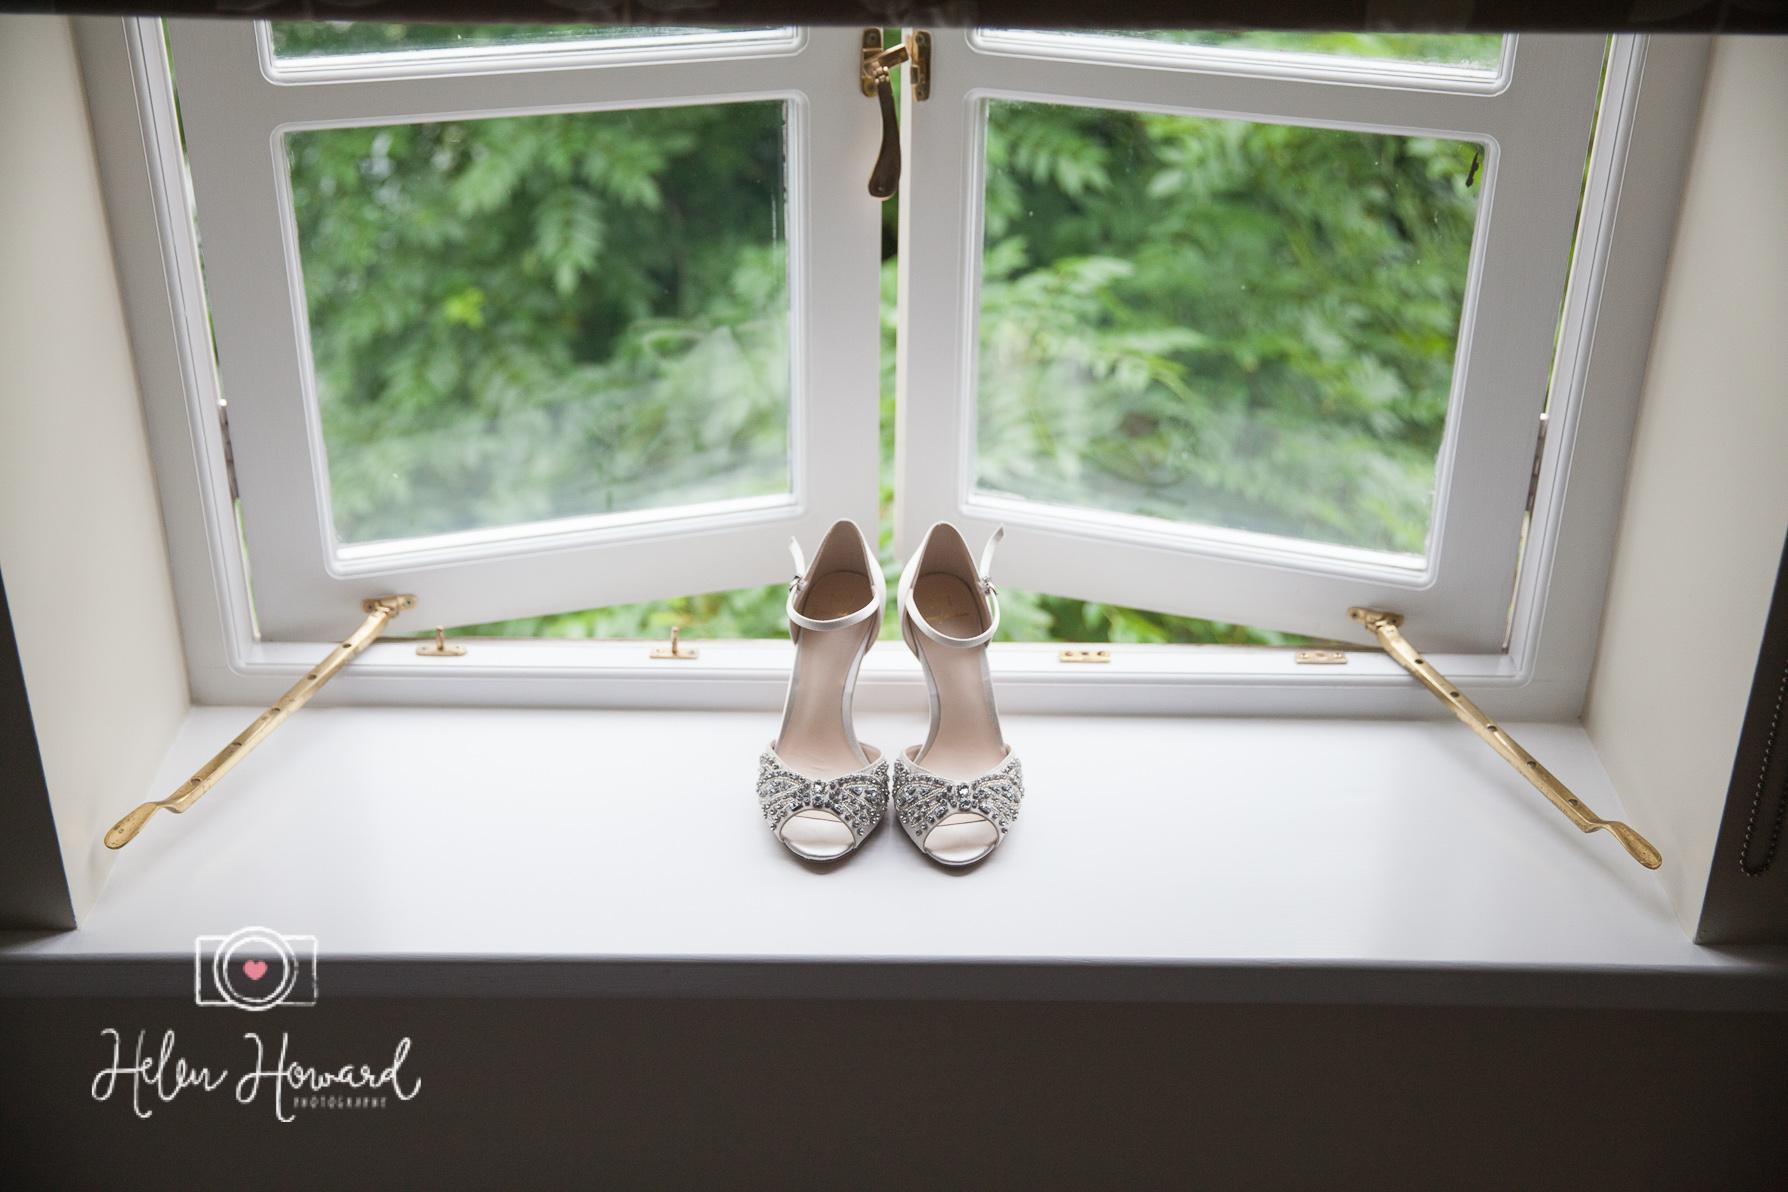 Helen Howard Photography Packington Moor Wedding-13.jpg